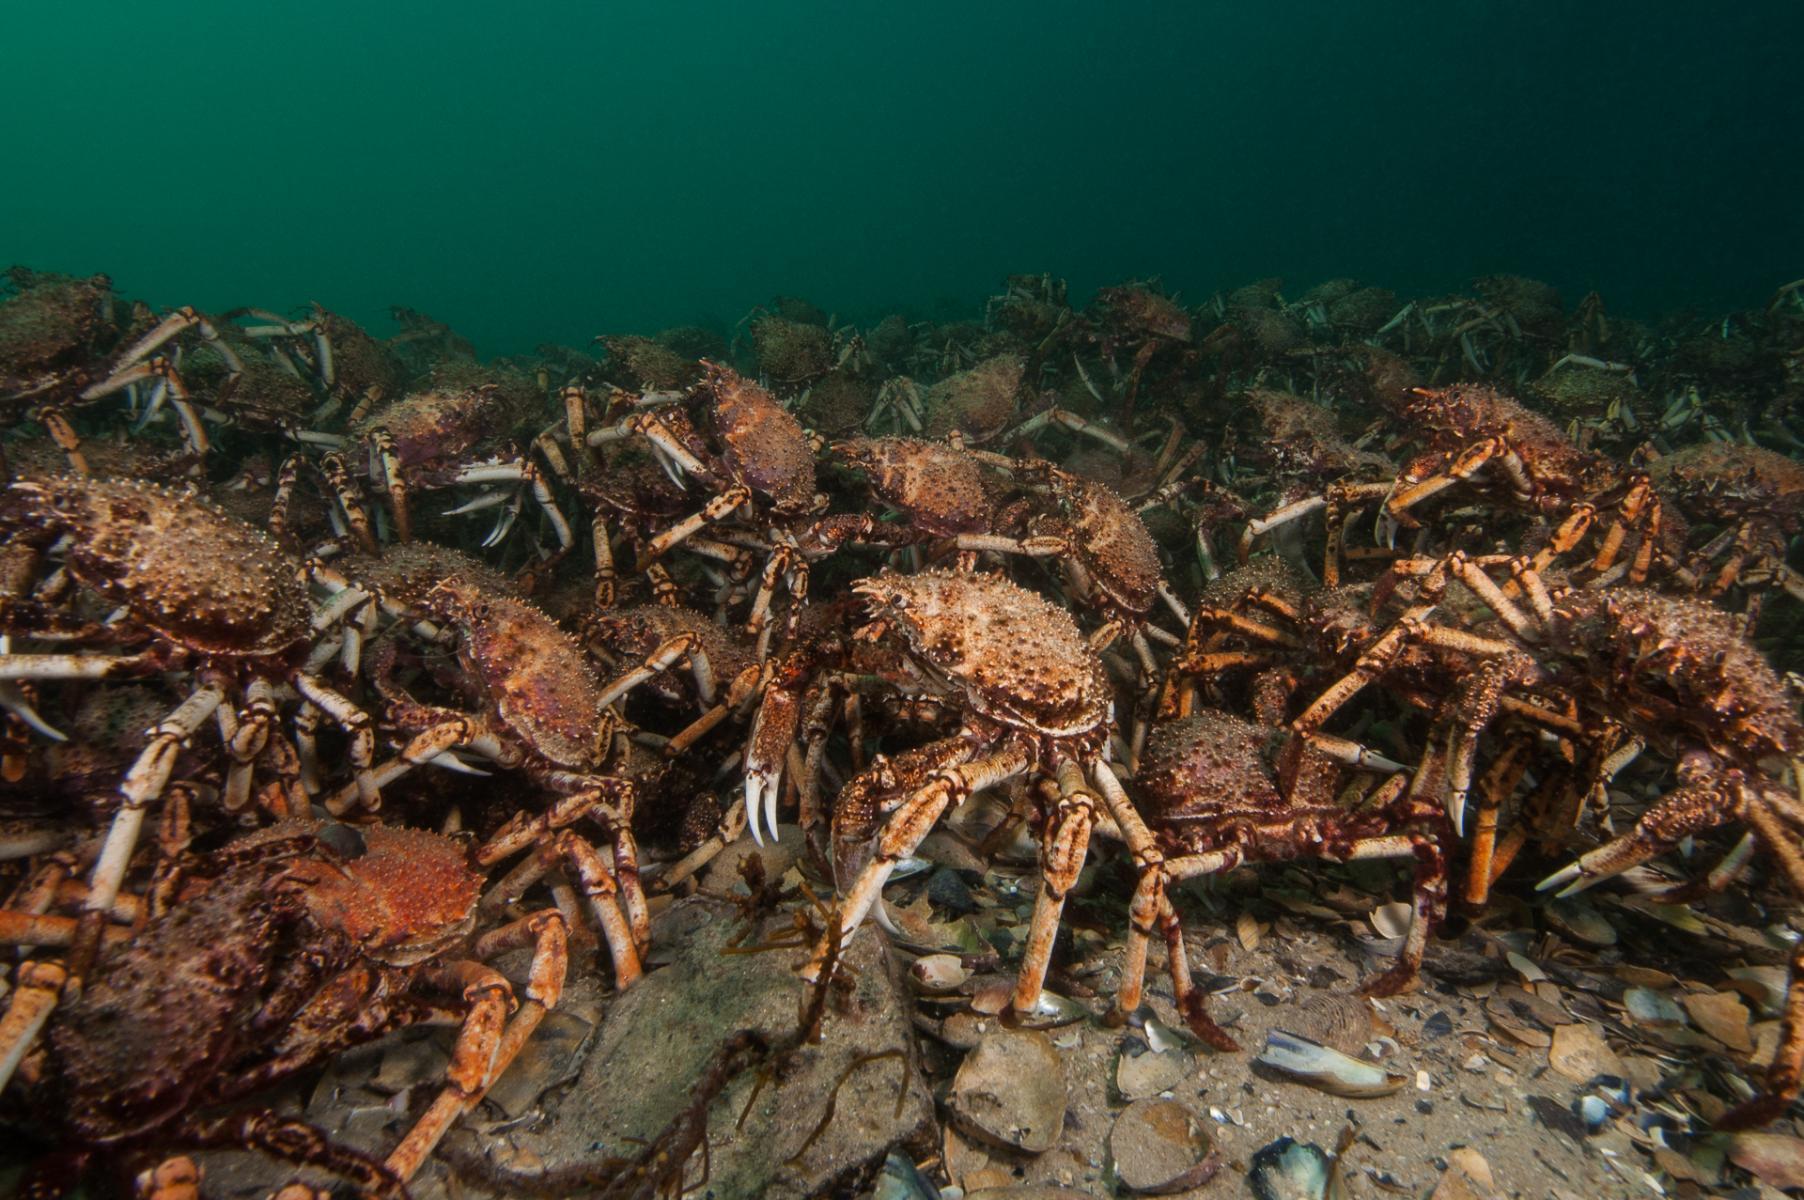 Leptomithrax gaimardii: giant spider crab